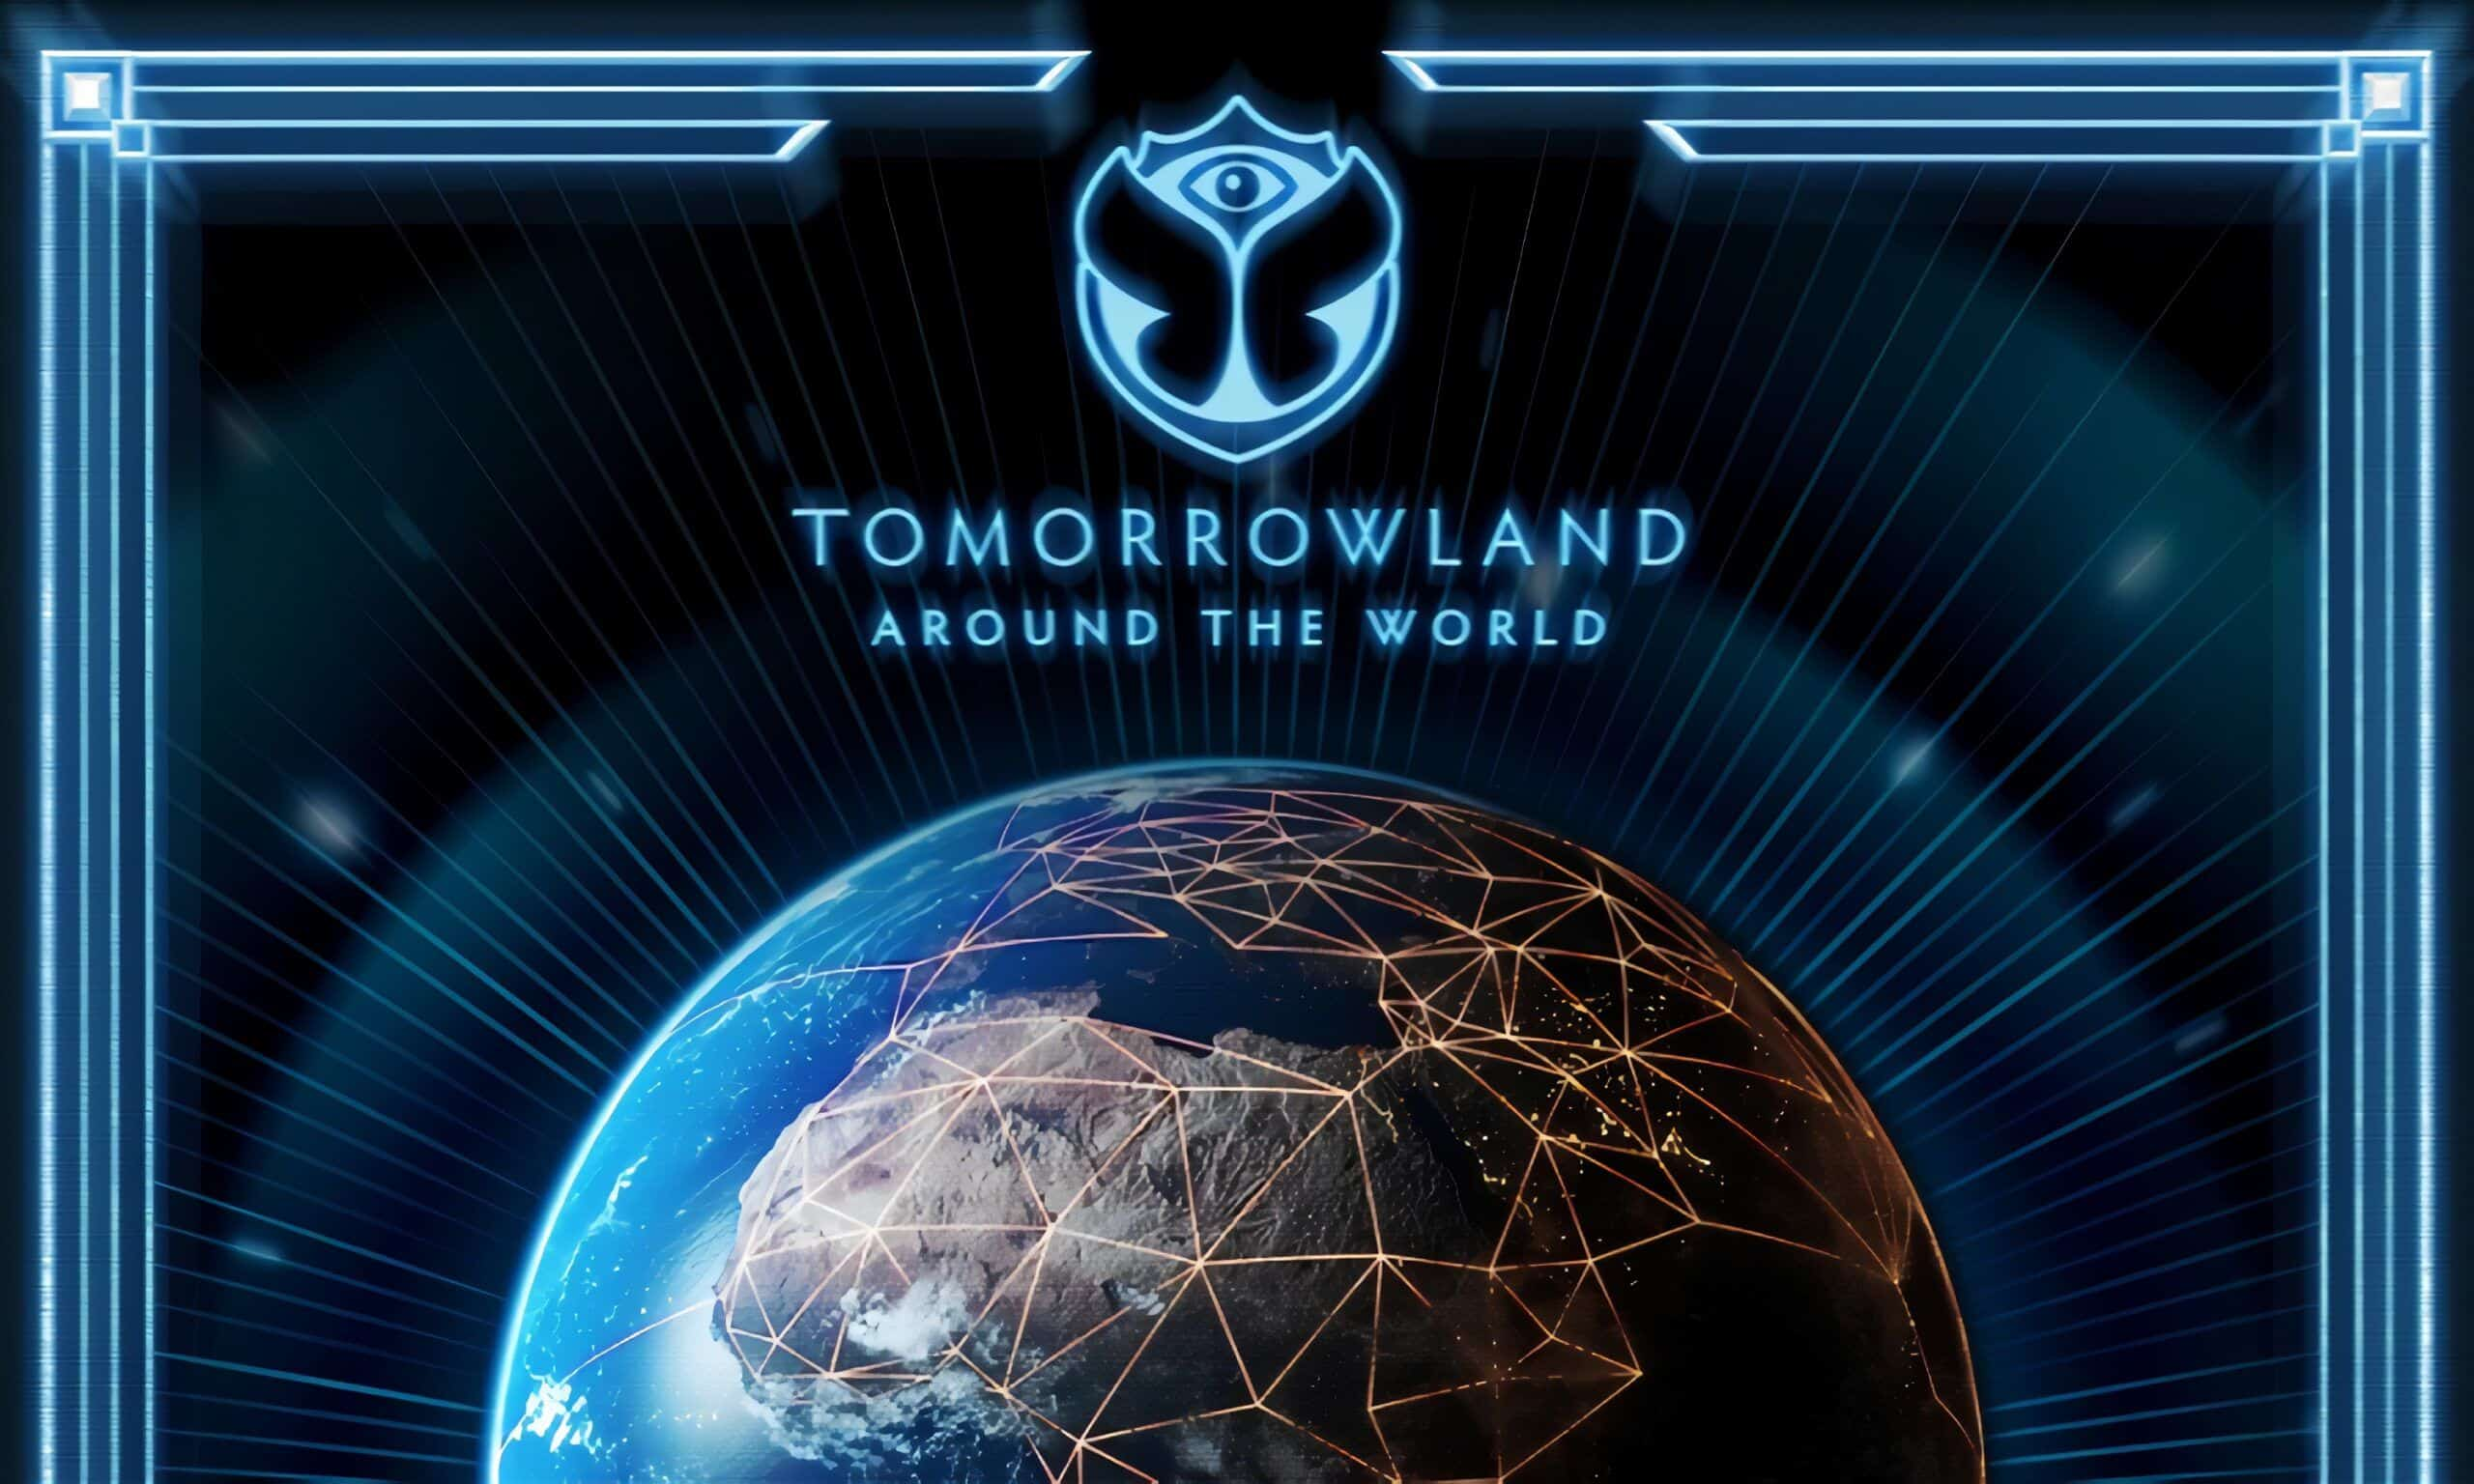 tomorrowland 2020 around the world